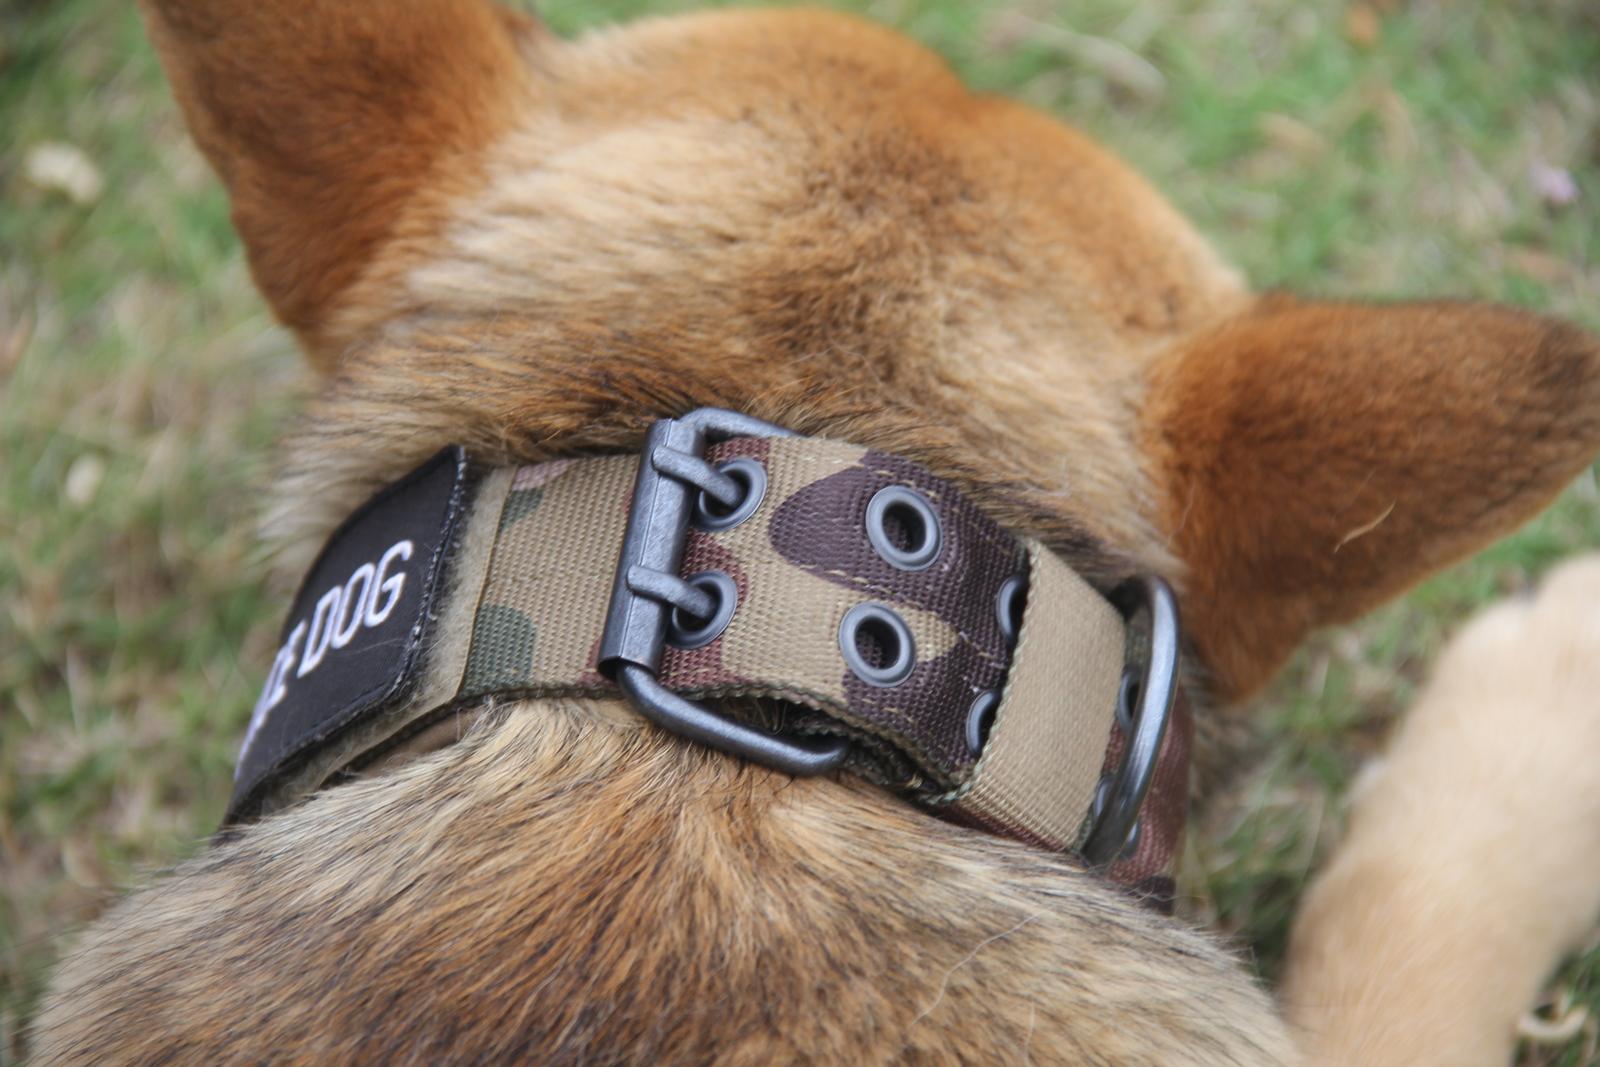 Tactical-Scorpion-Gear-Dog-Collar-Canine-K9-Training-Walking-Military-Nylon thumbnail 15